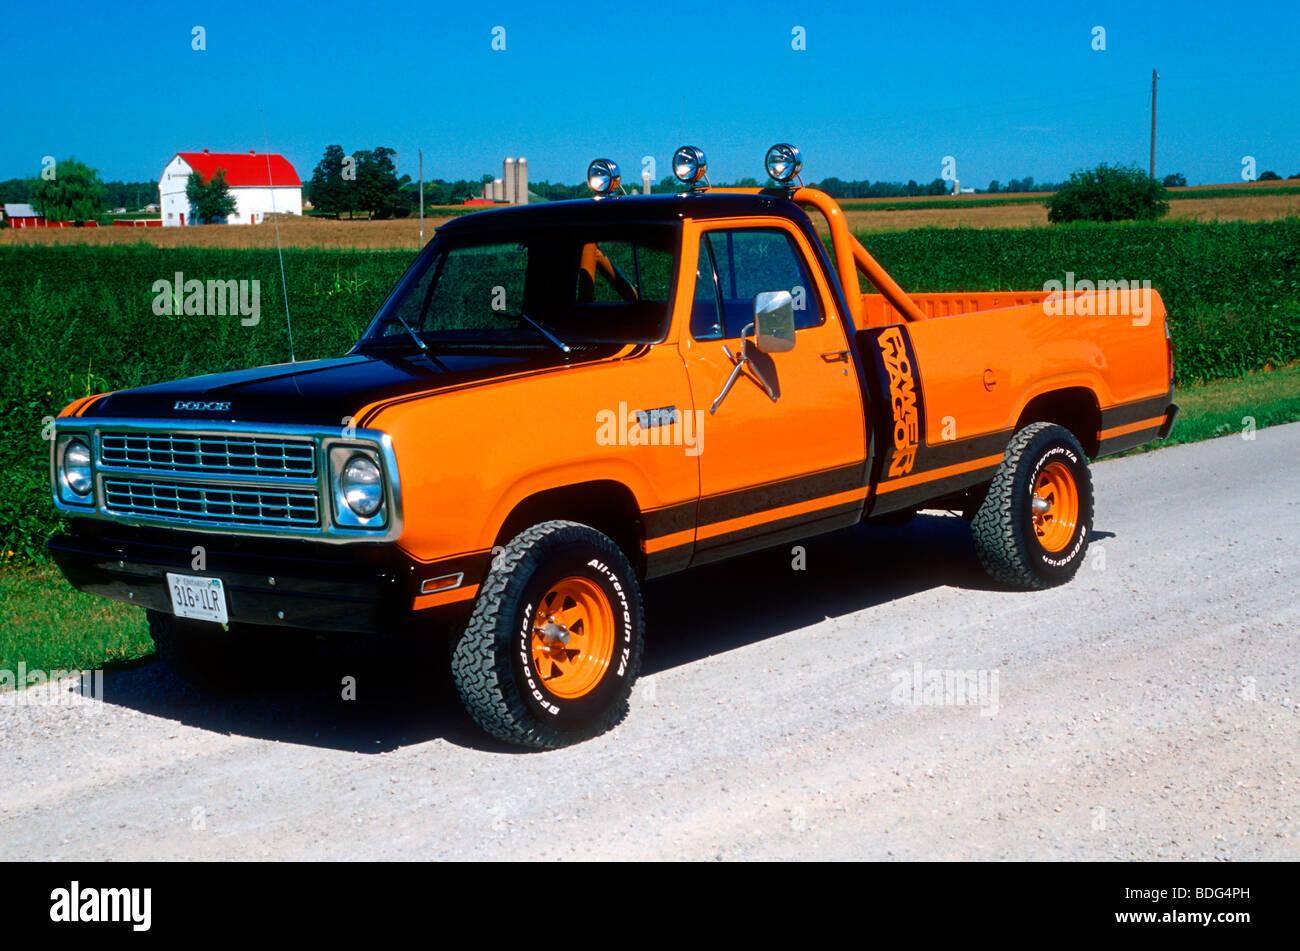 2018 Dodge Power Wagon >> 1979 Dodge Macho Power Wagon Stock Photo, Royalty Free Image: 25555897 - Alamy